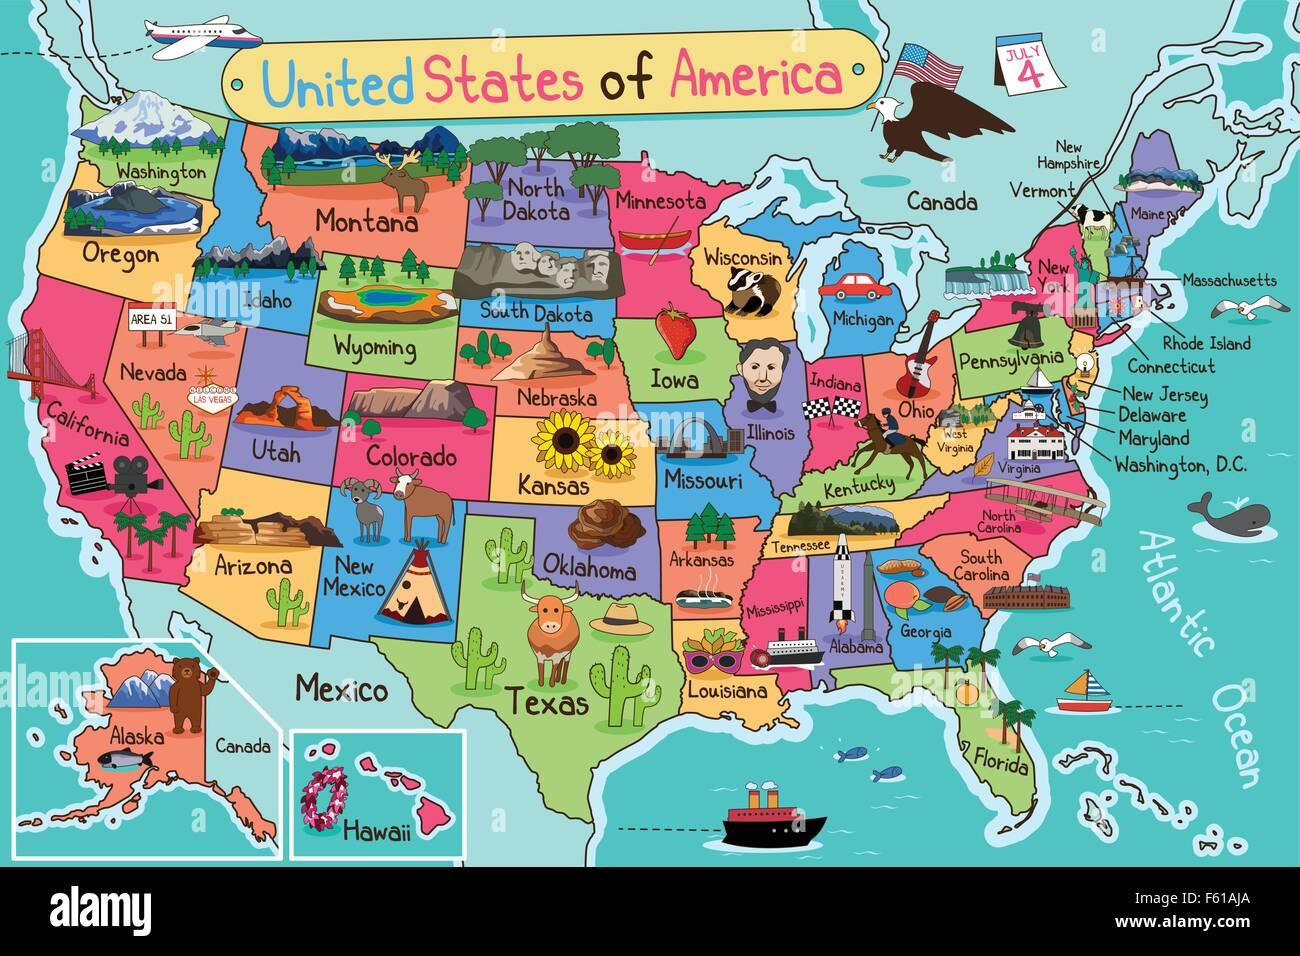 New Mexico Map Stockfotos & New Mexico Map Bilder - Alamy